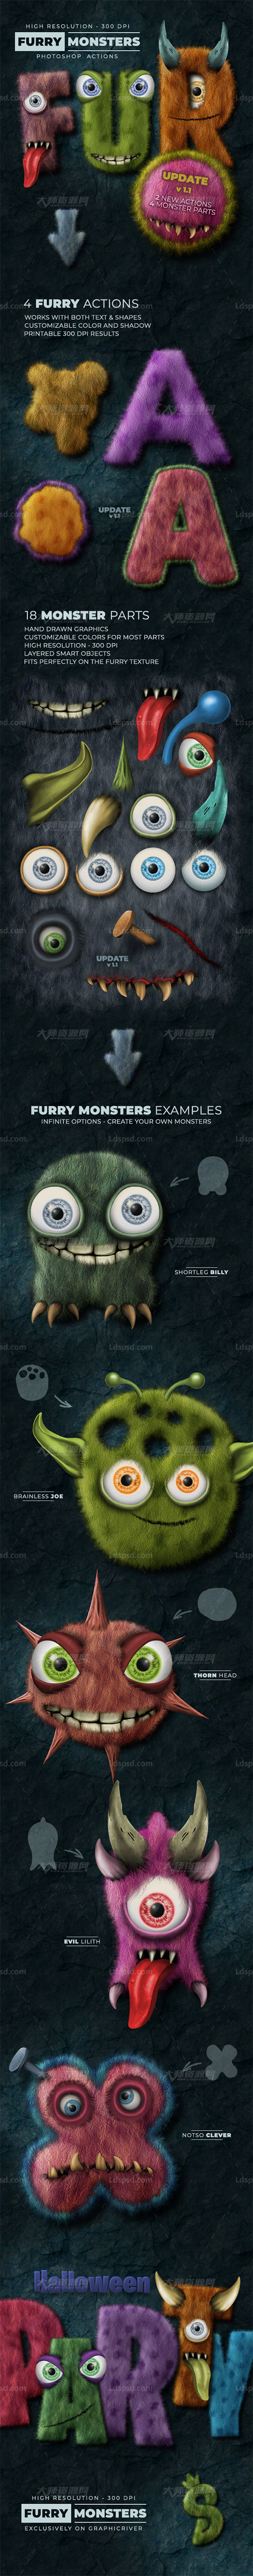 极品PS动作-毛茸怪物(含高清视频教程):Furry Monster Actions - 300 DPI